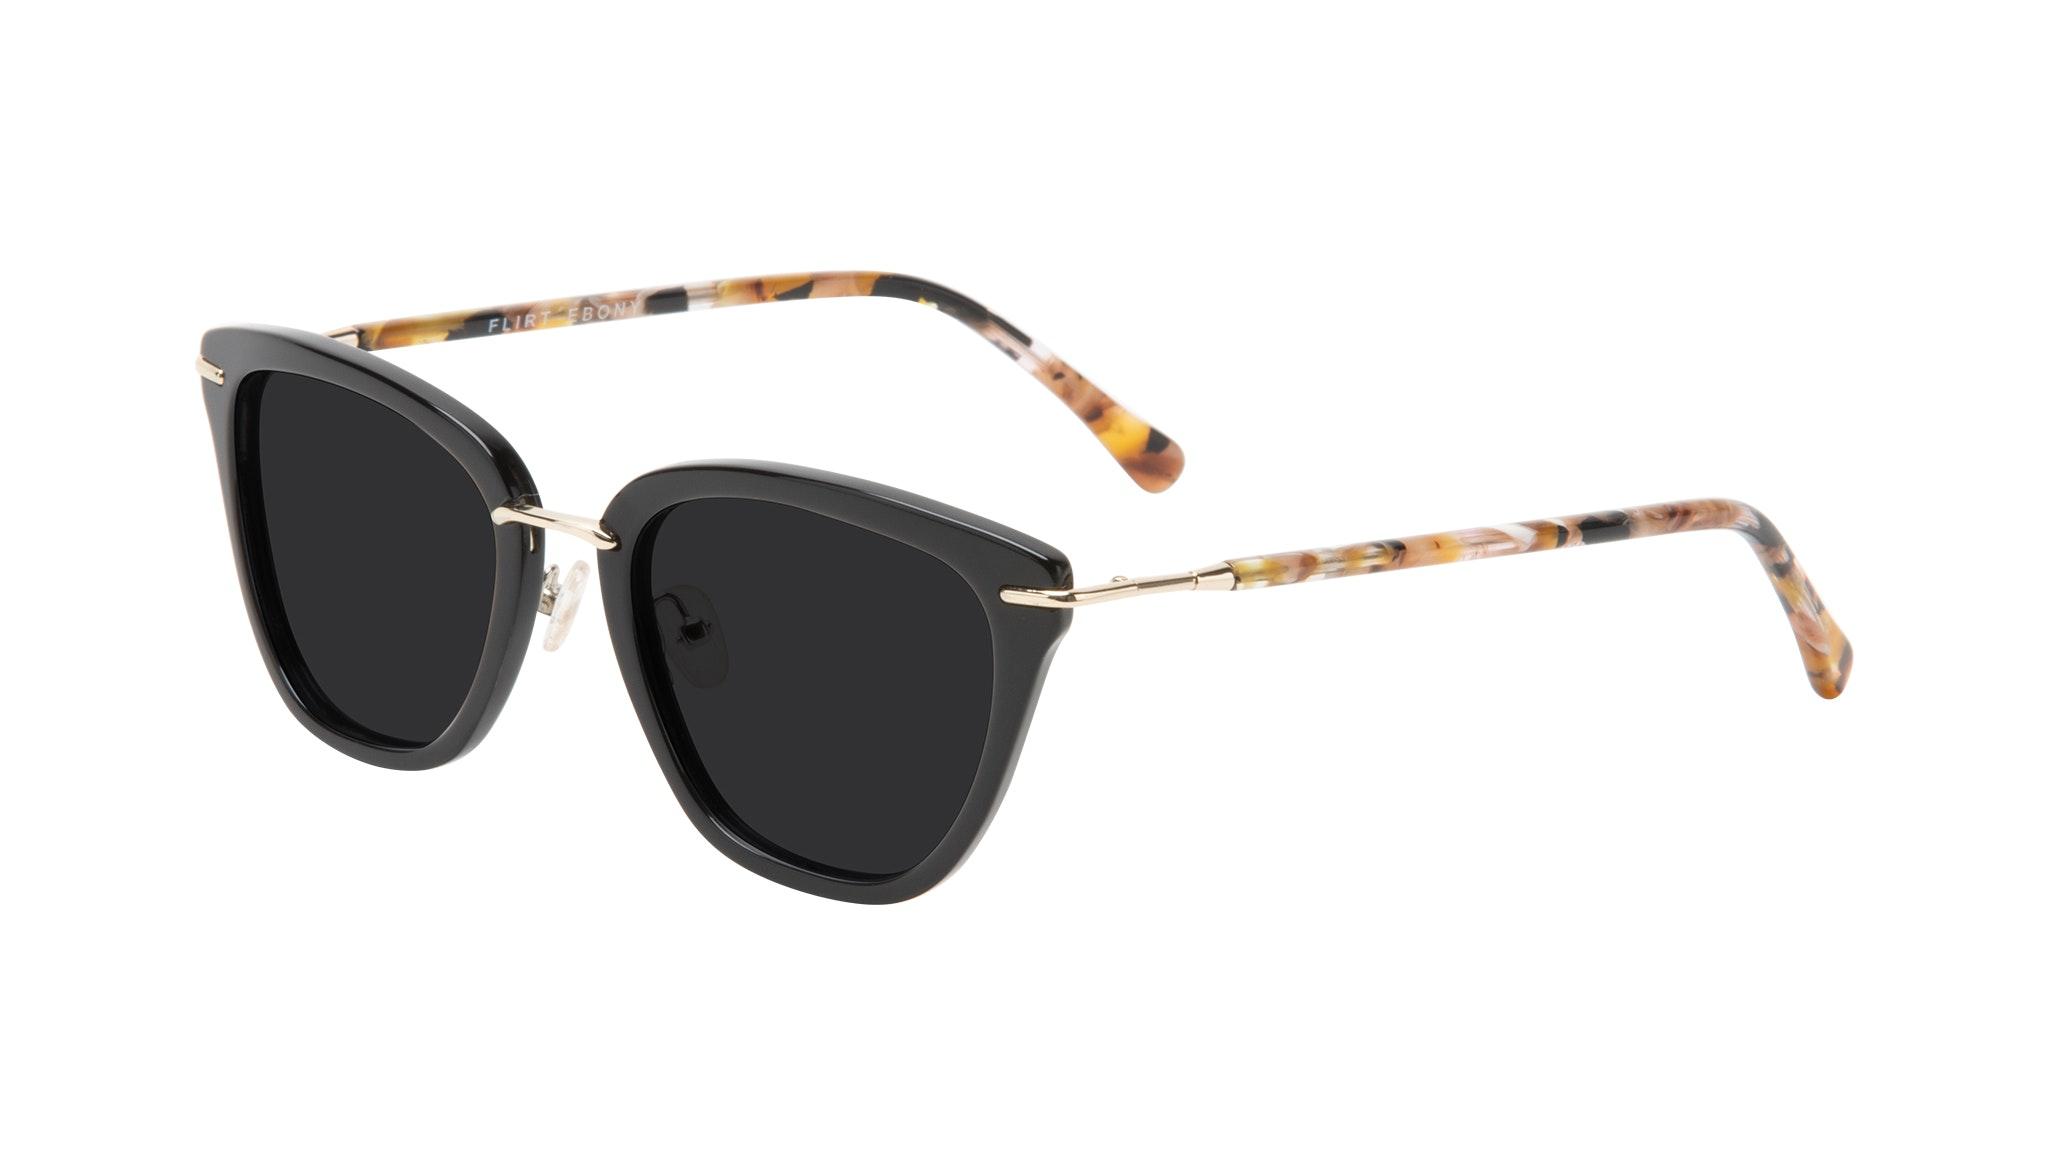 Affordable Fashion Glasses Square Sunglasses Women Flirt Ebony Tilt